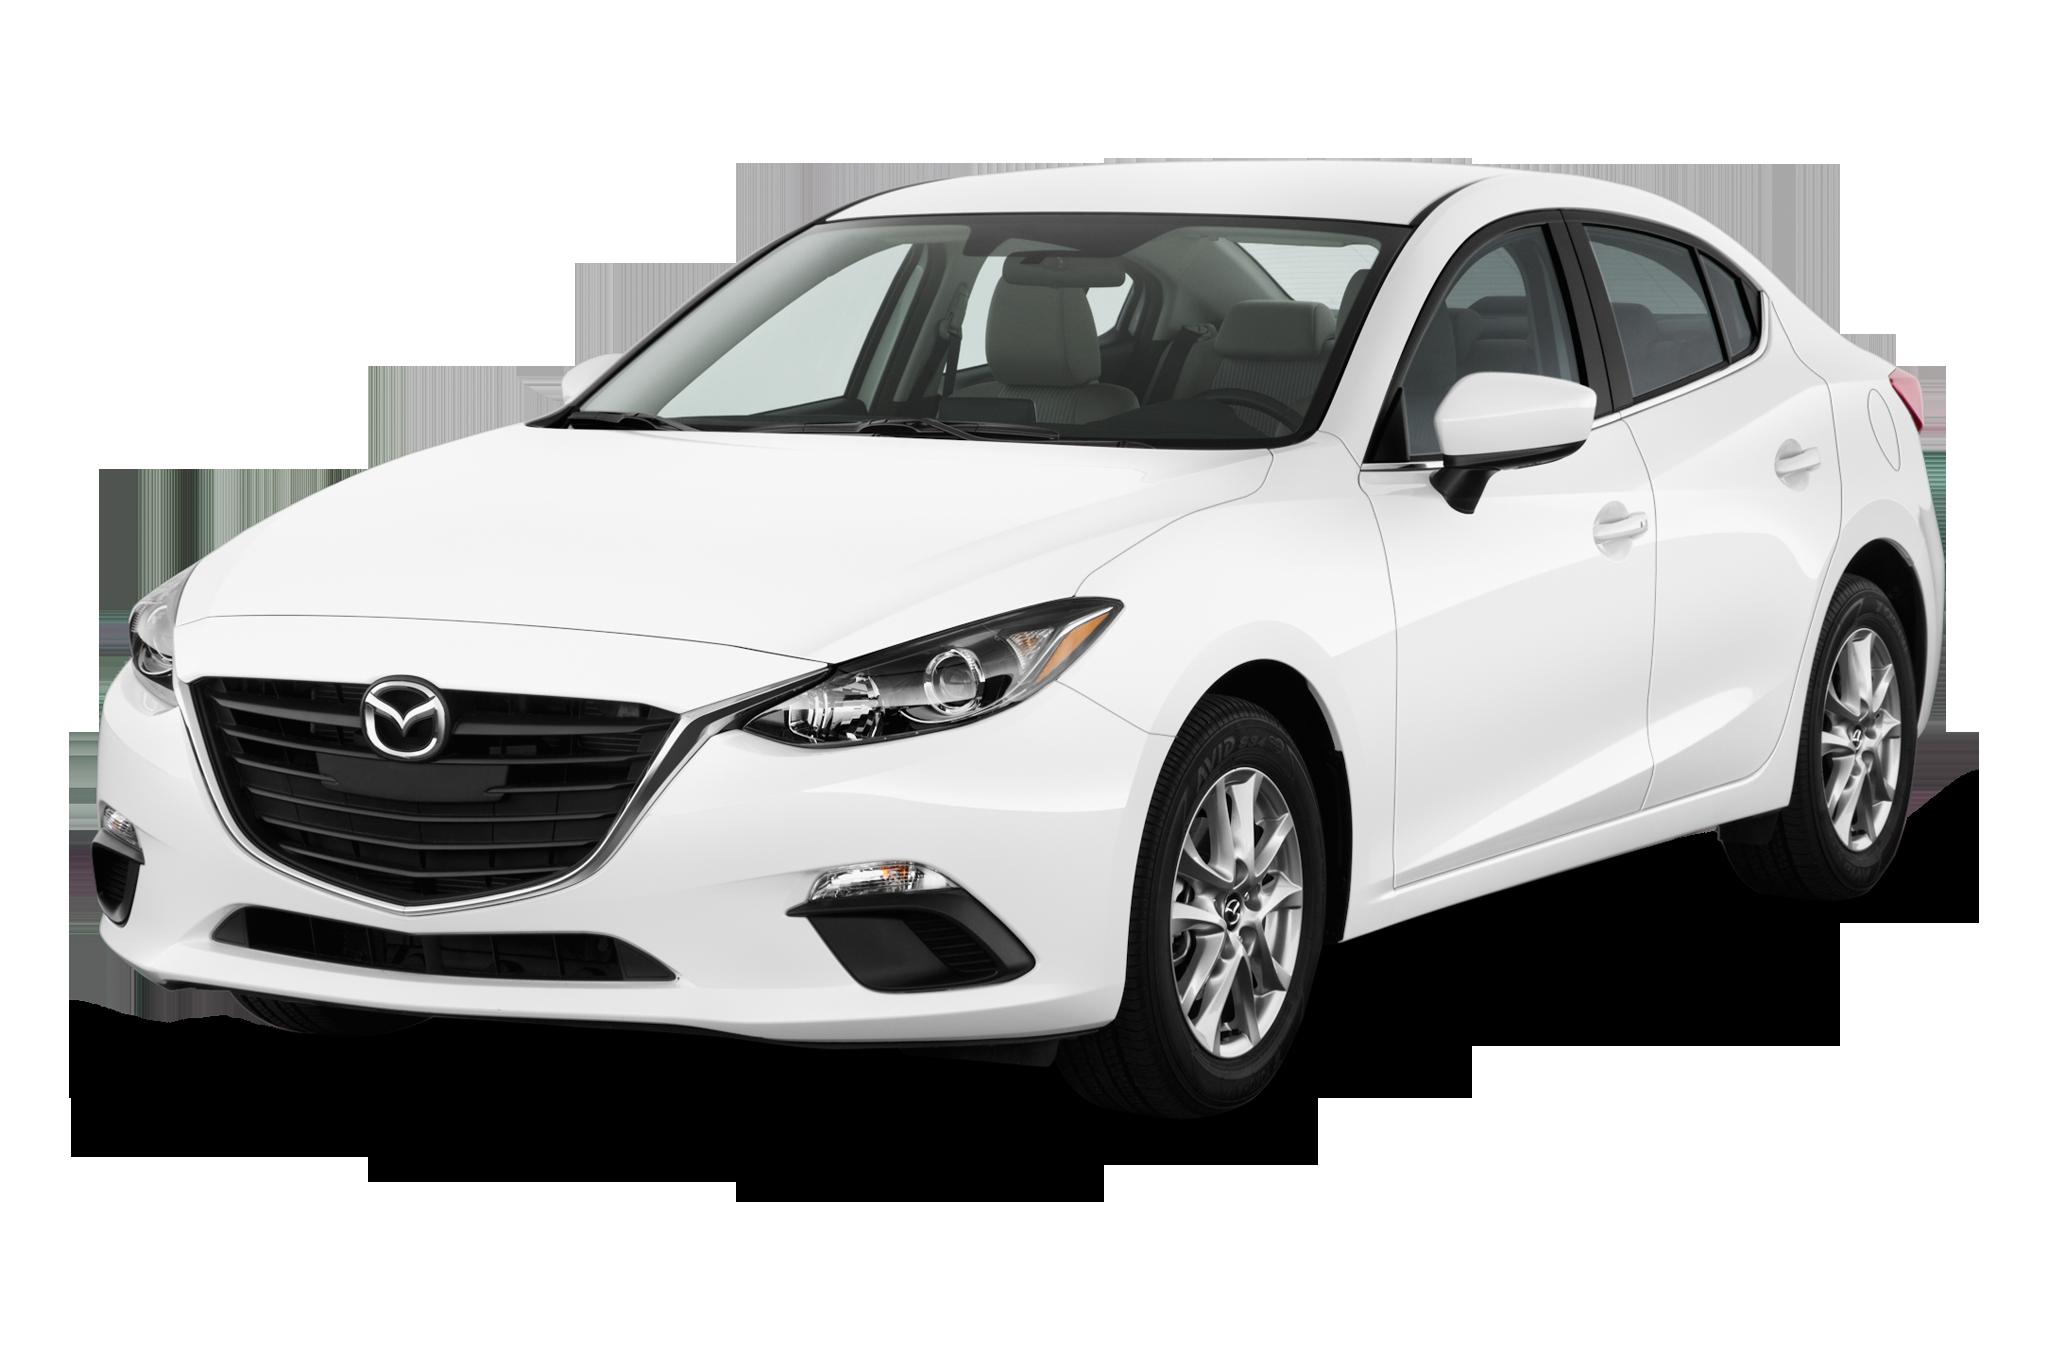 http://st.automobilemag.com/uploads/sites/10/2015/11/2014-mazda-mazda3-i-touring-sedan-angular-front.png?interpolation=lanczos-none&fit=around|300:199